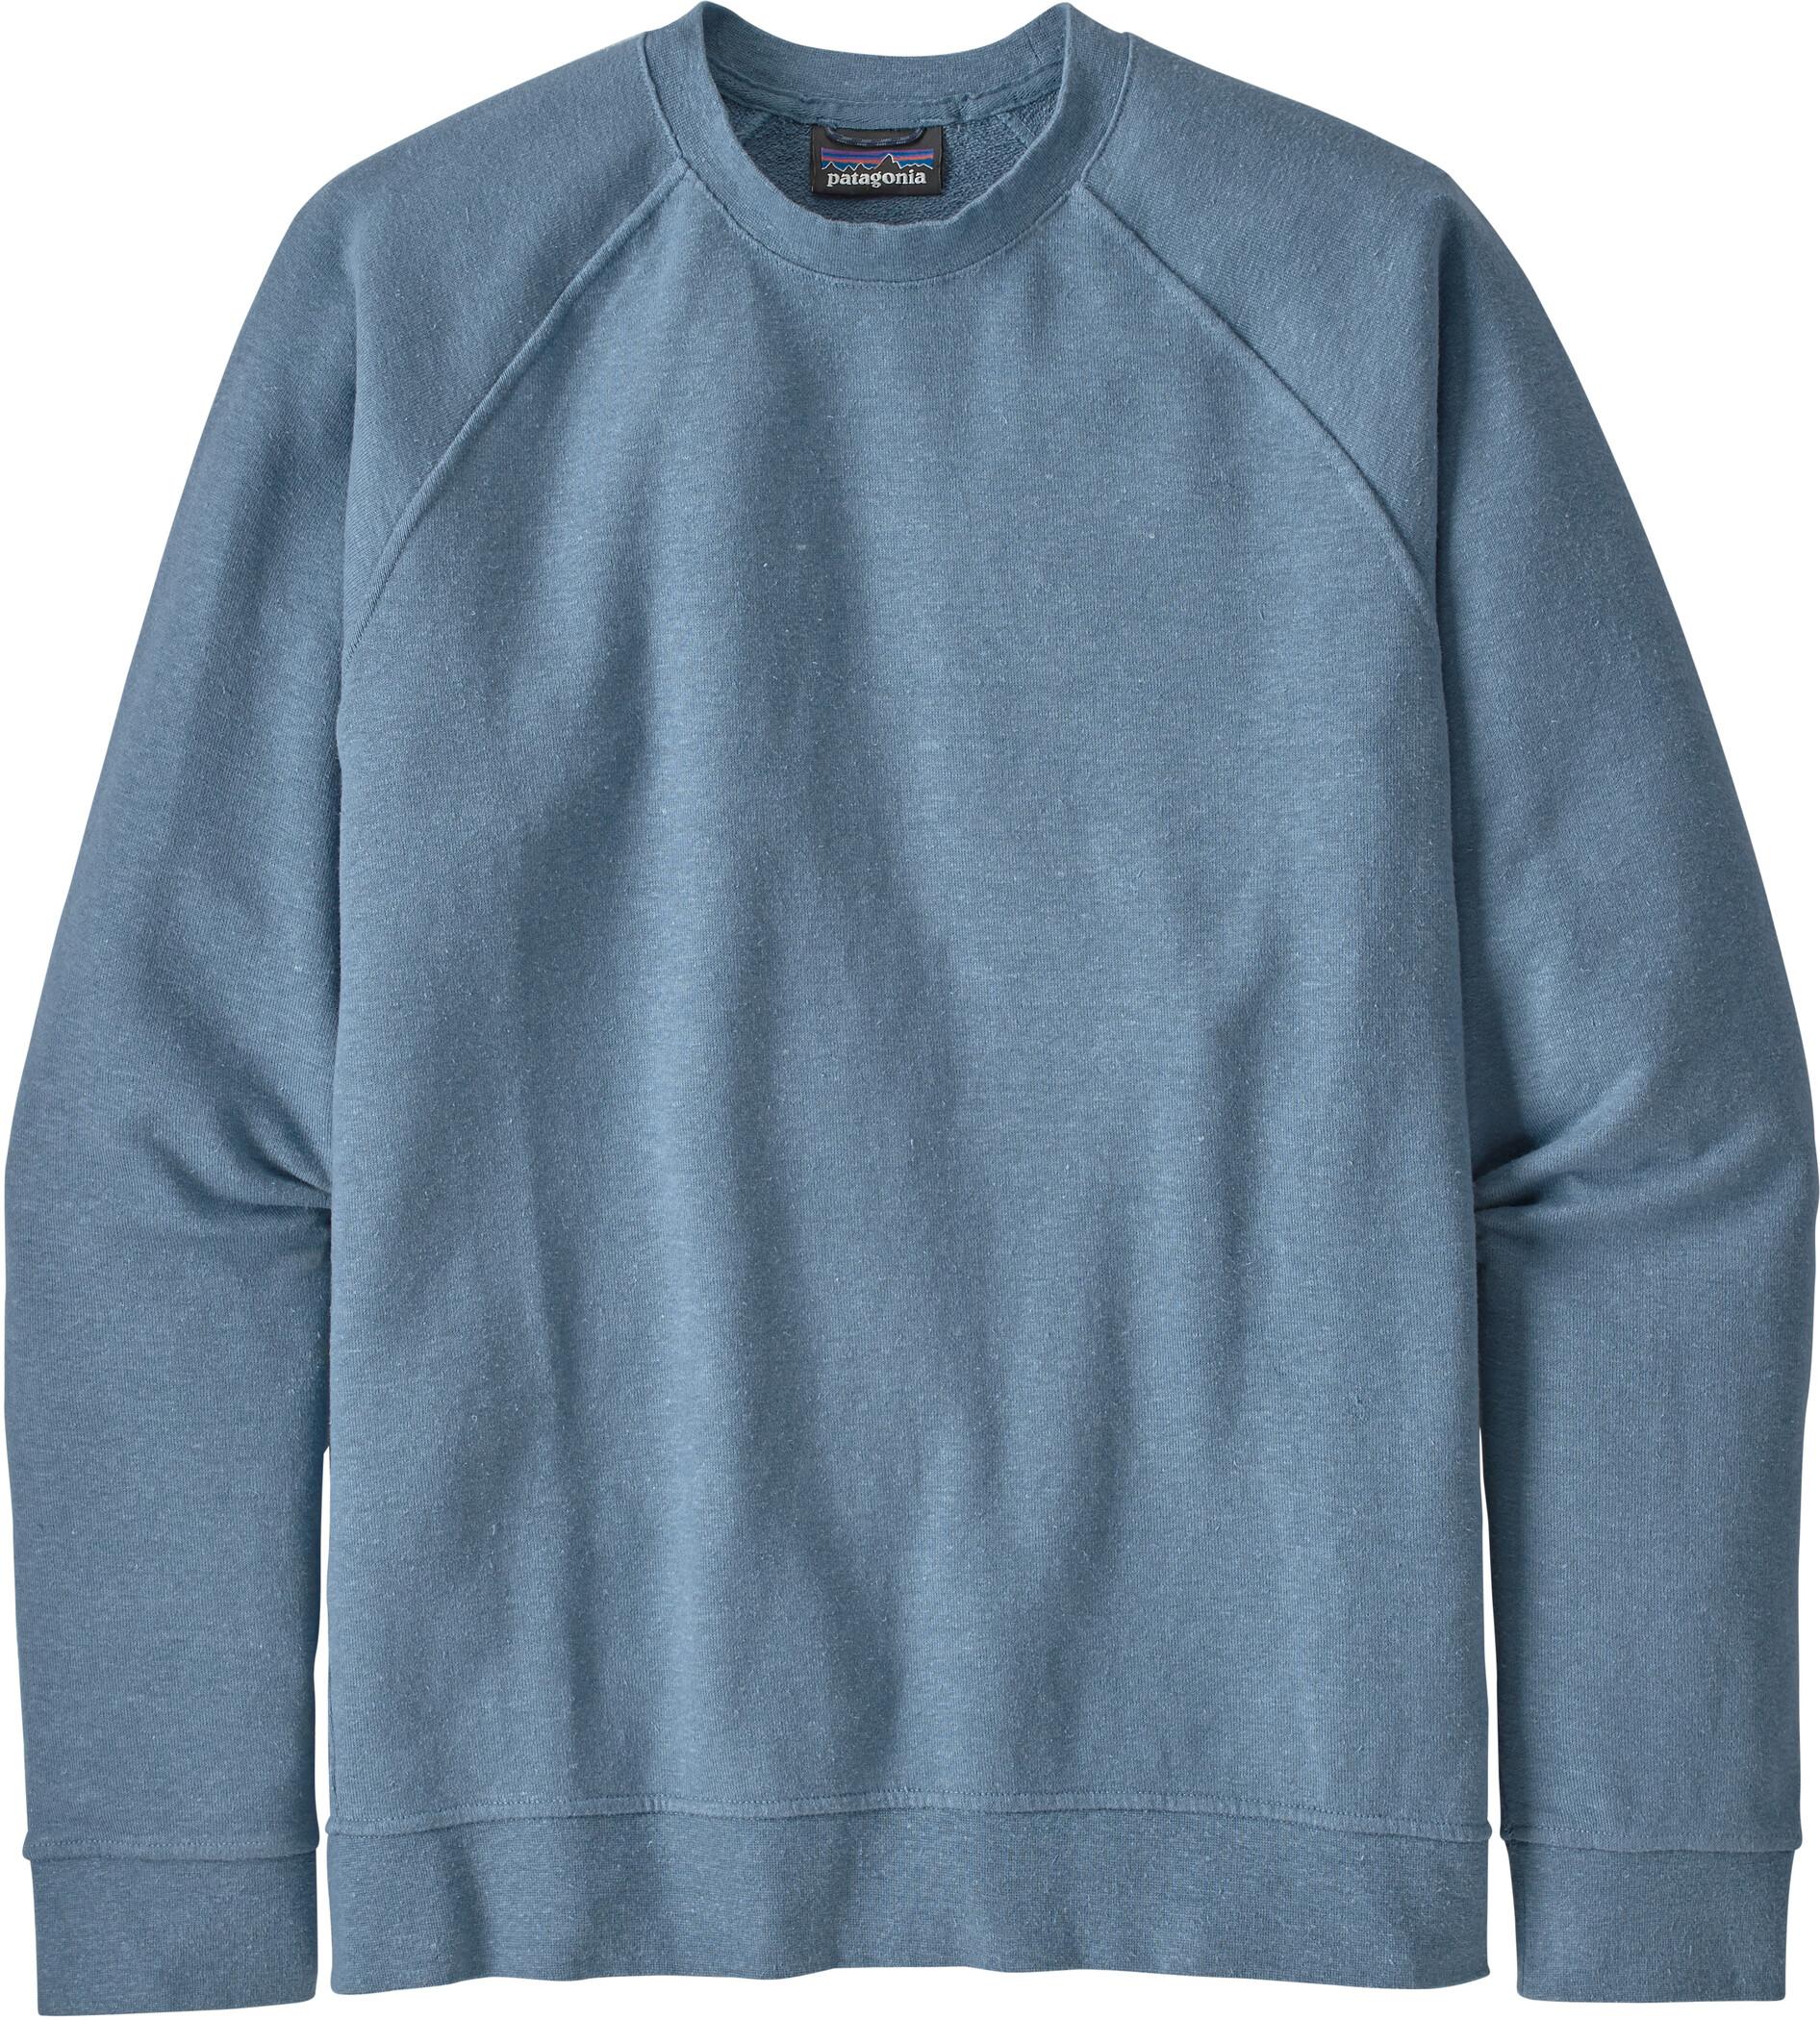 Patagonia Trail Harbor Crewneck Sweatshirt Men blue